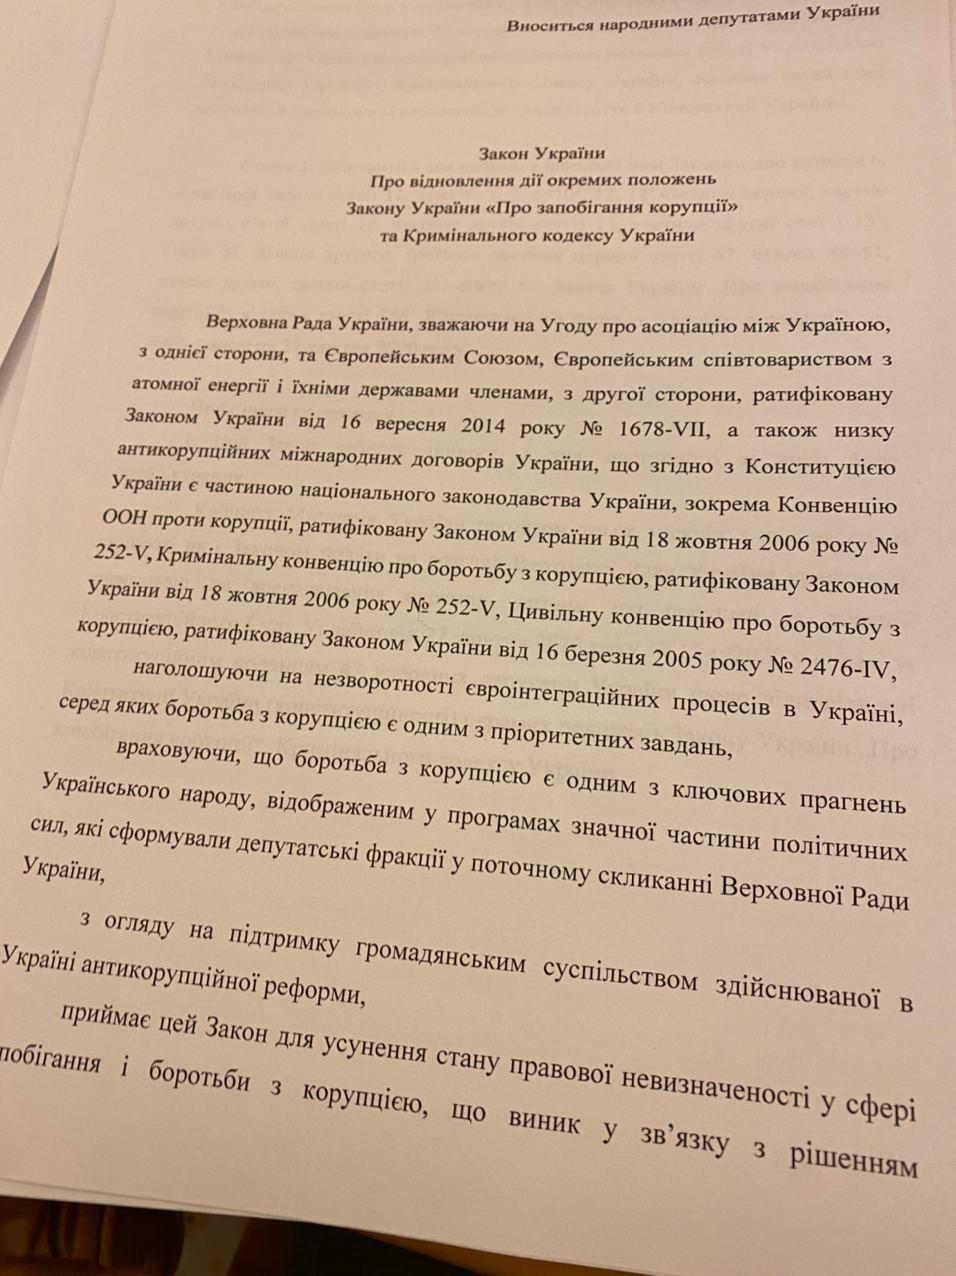 Законопроект Зеленского о КСУ